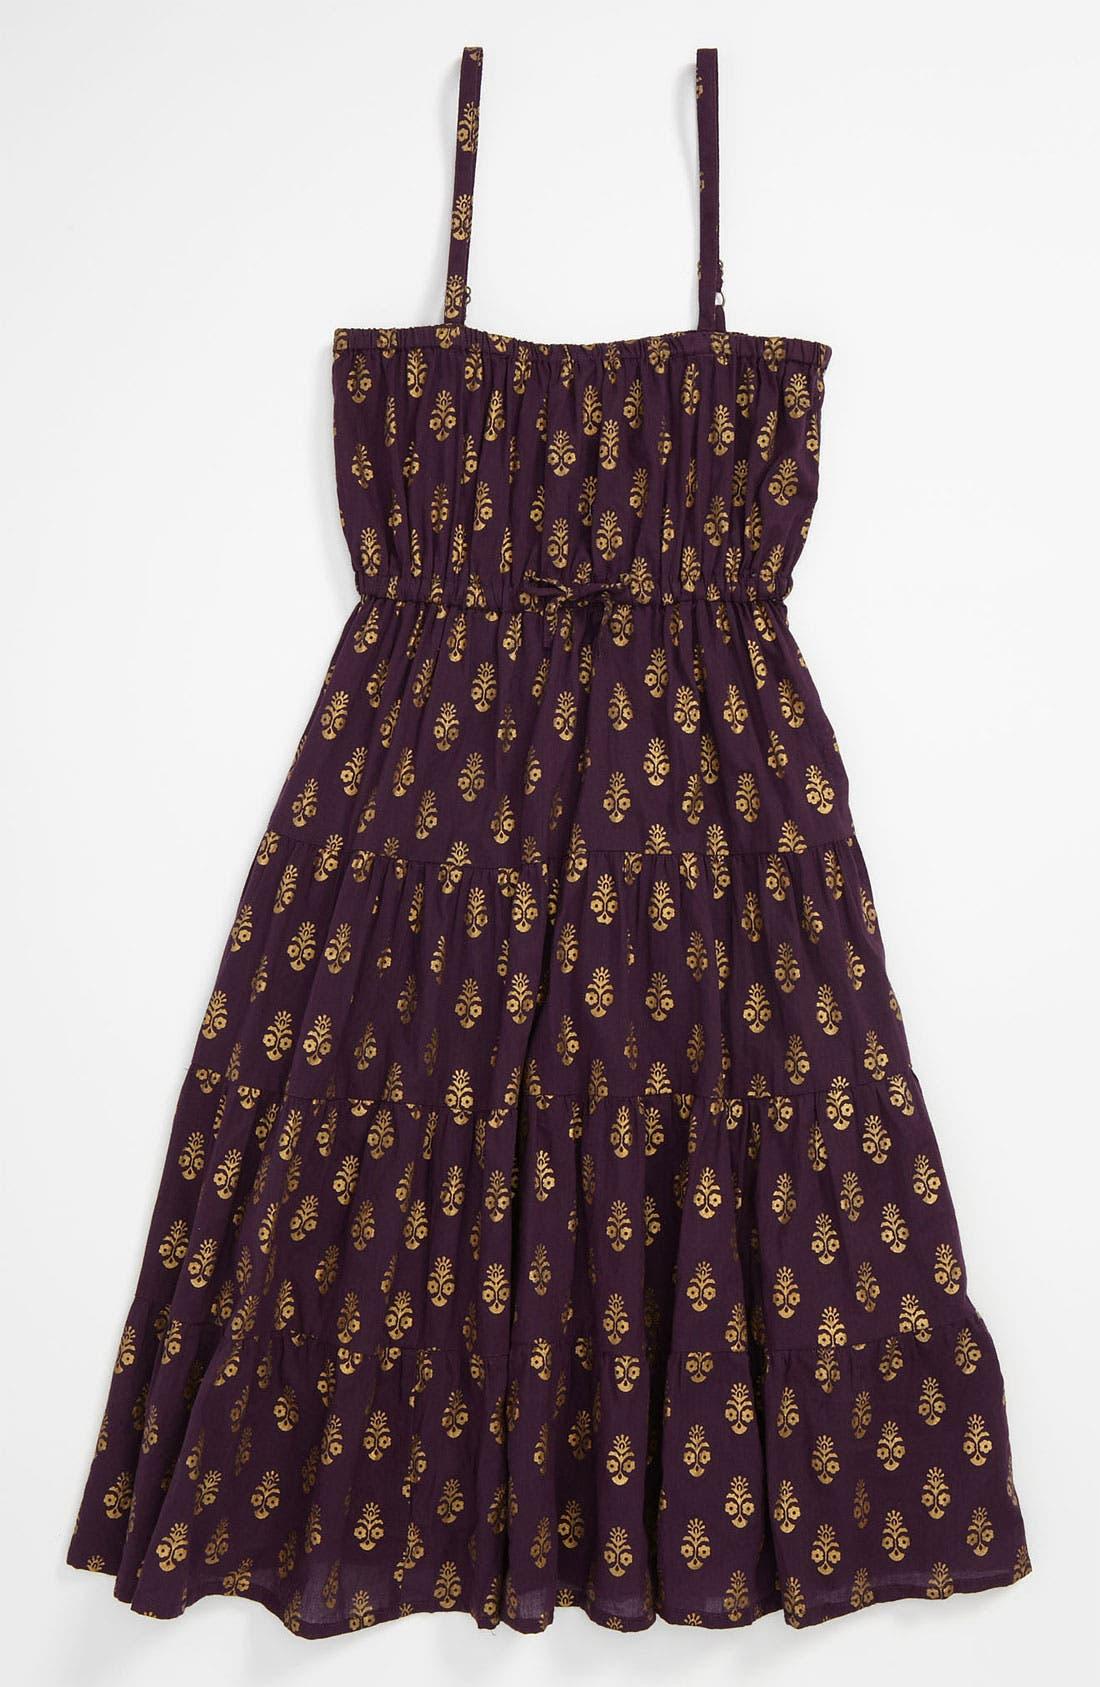 Alternate Image 1 Selected - Peek 'Venezia' Dress (Toddler, Little Girls & Big Girls)